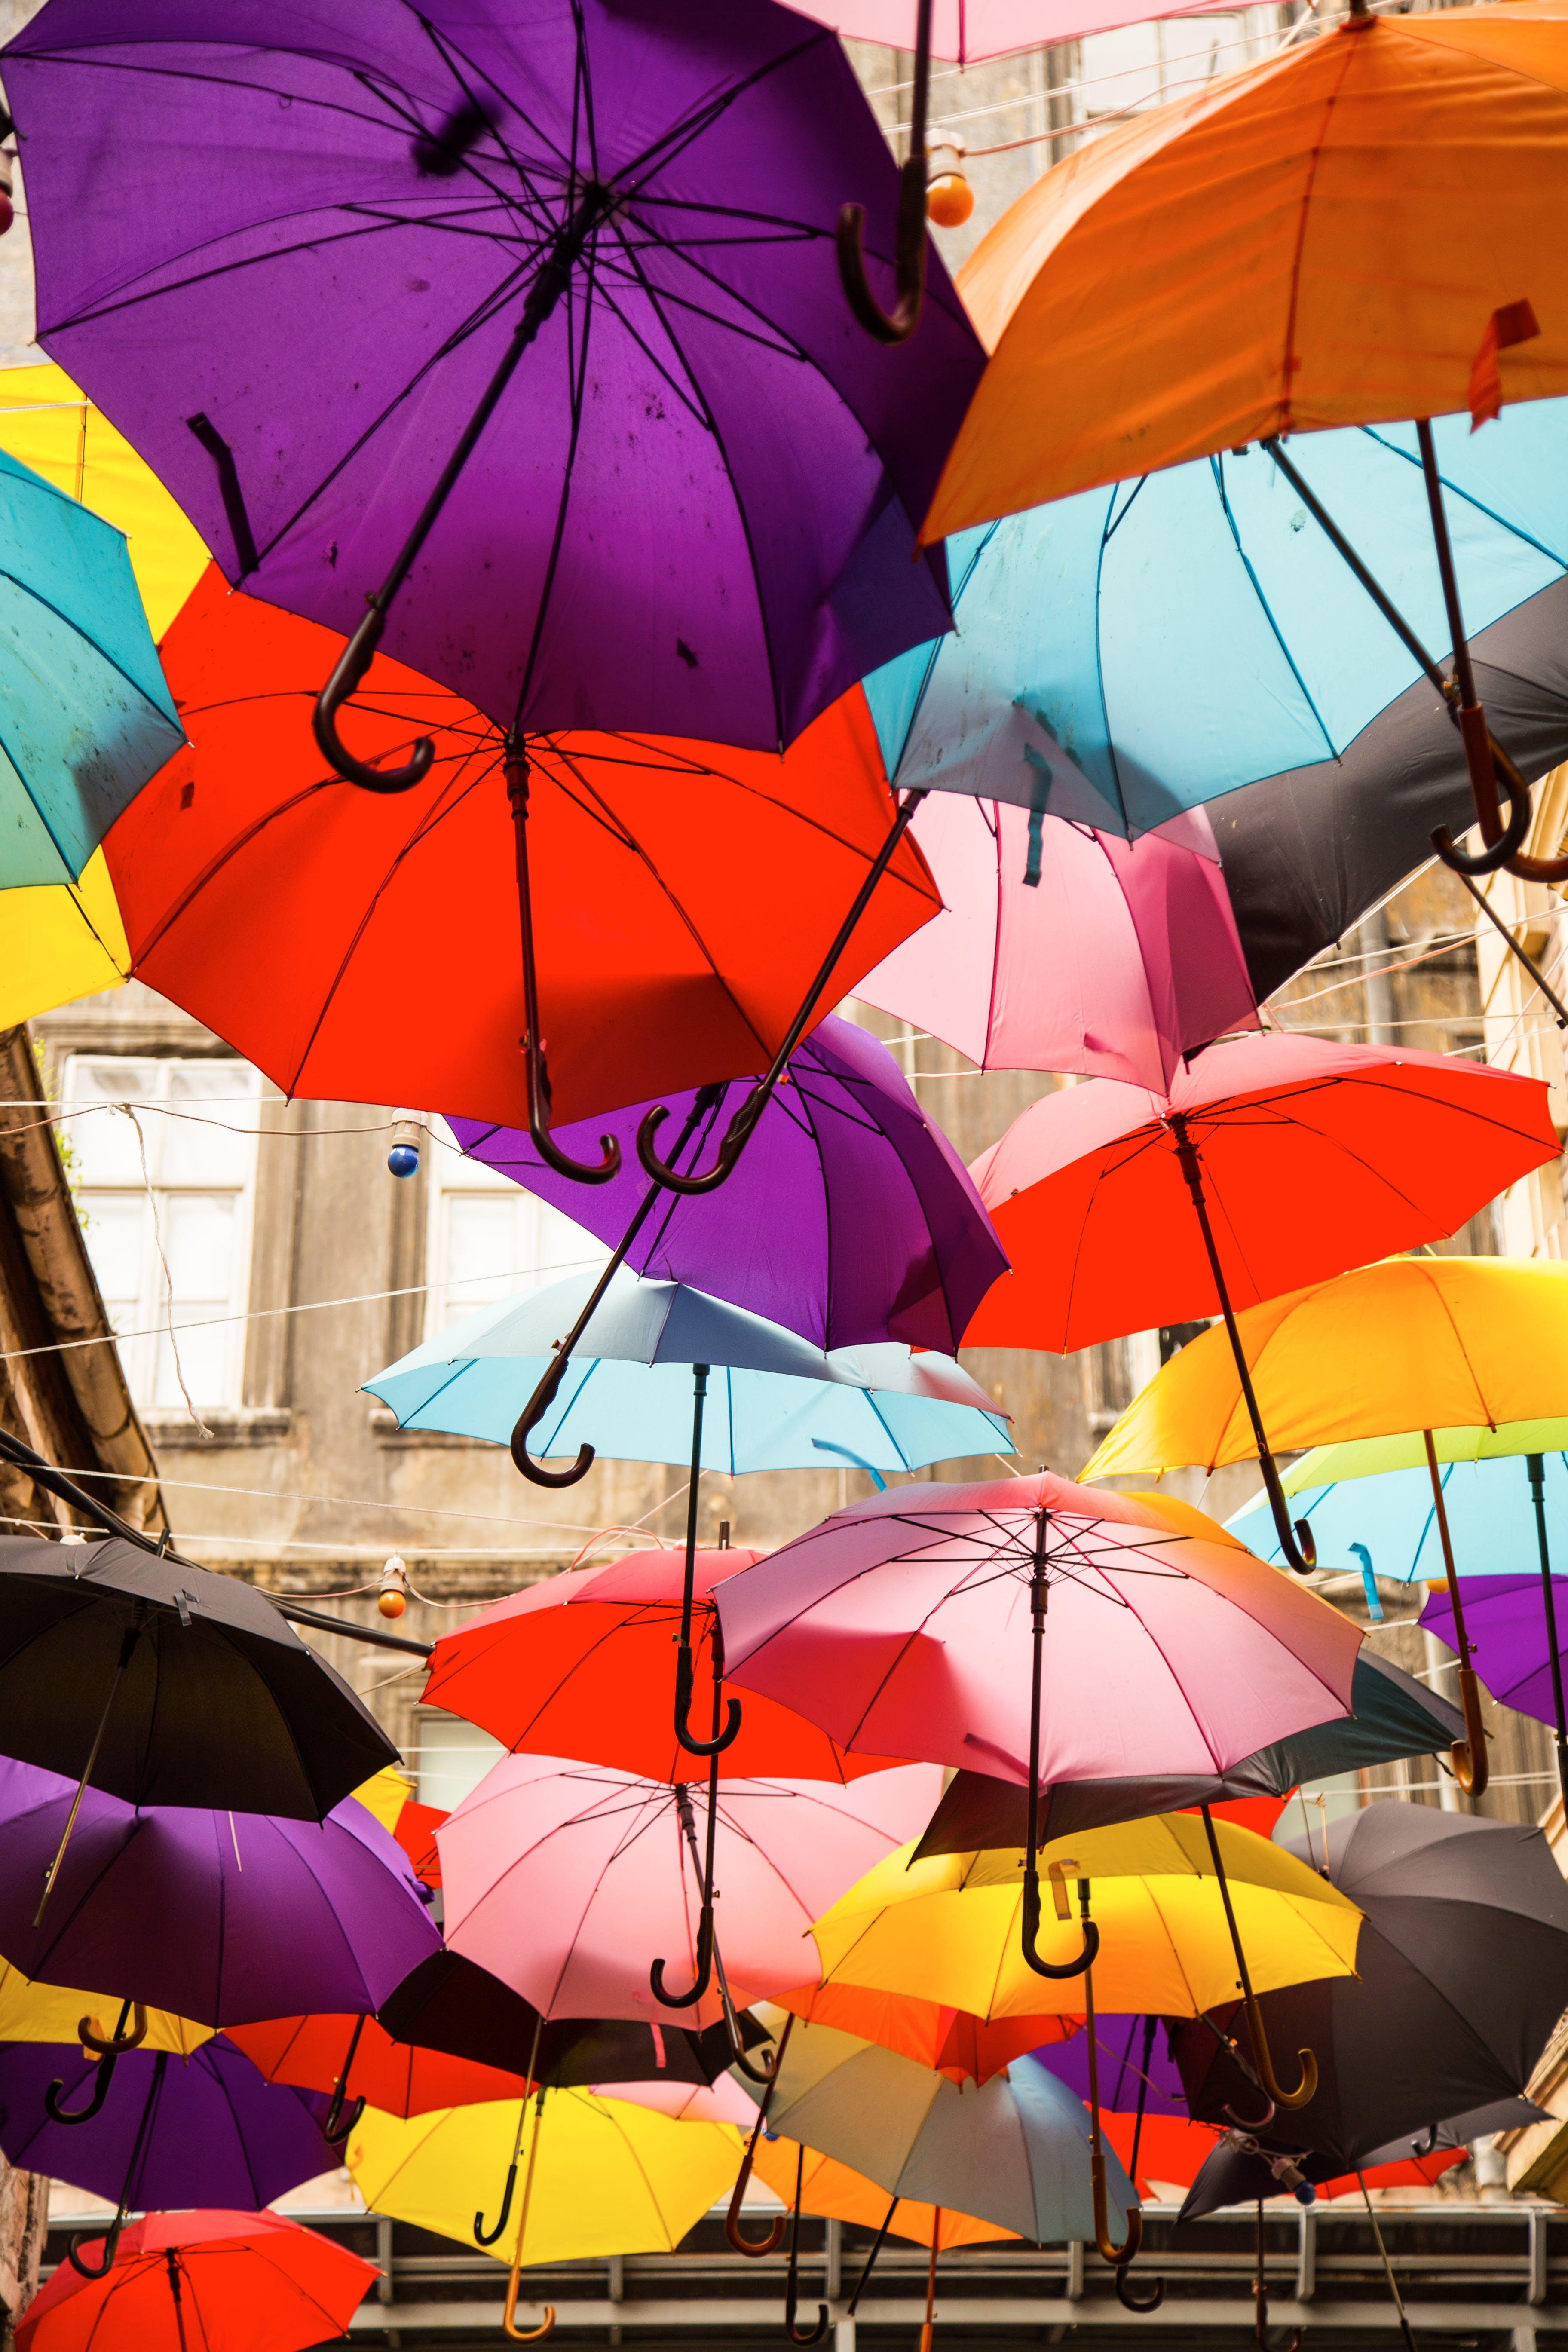 Assorted-color Hanging Umbrellas